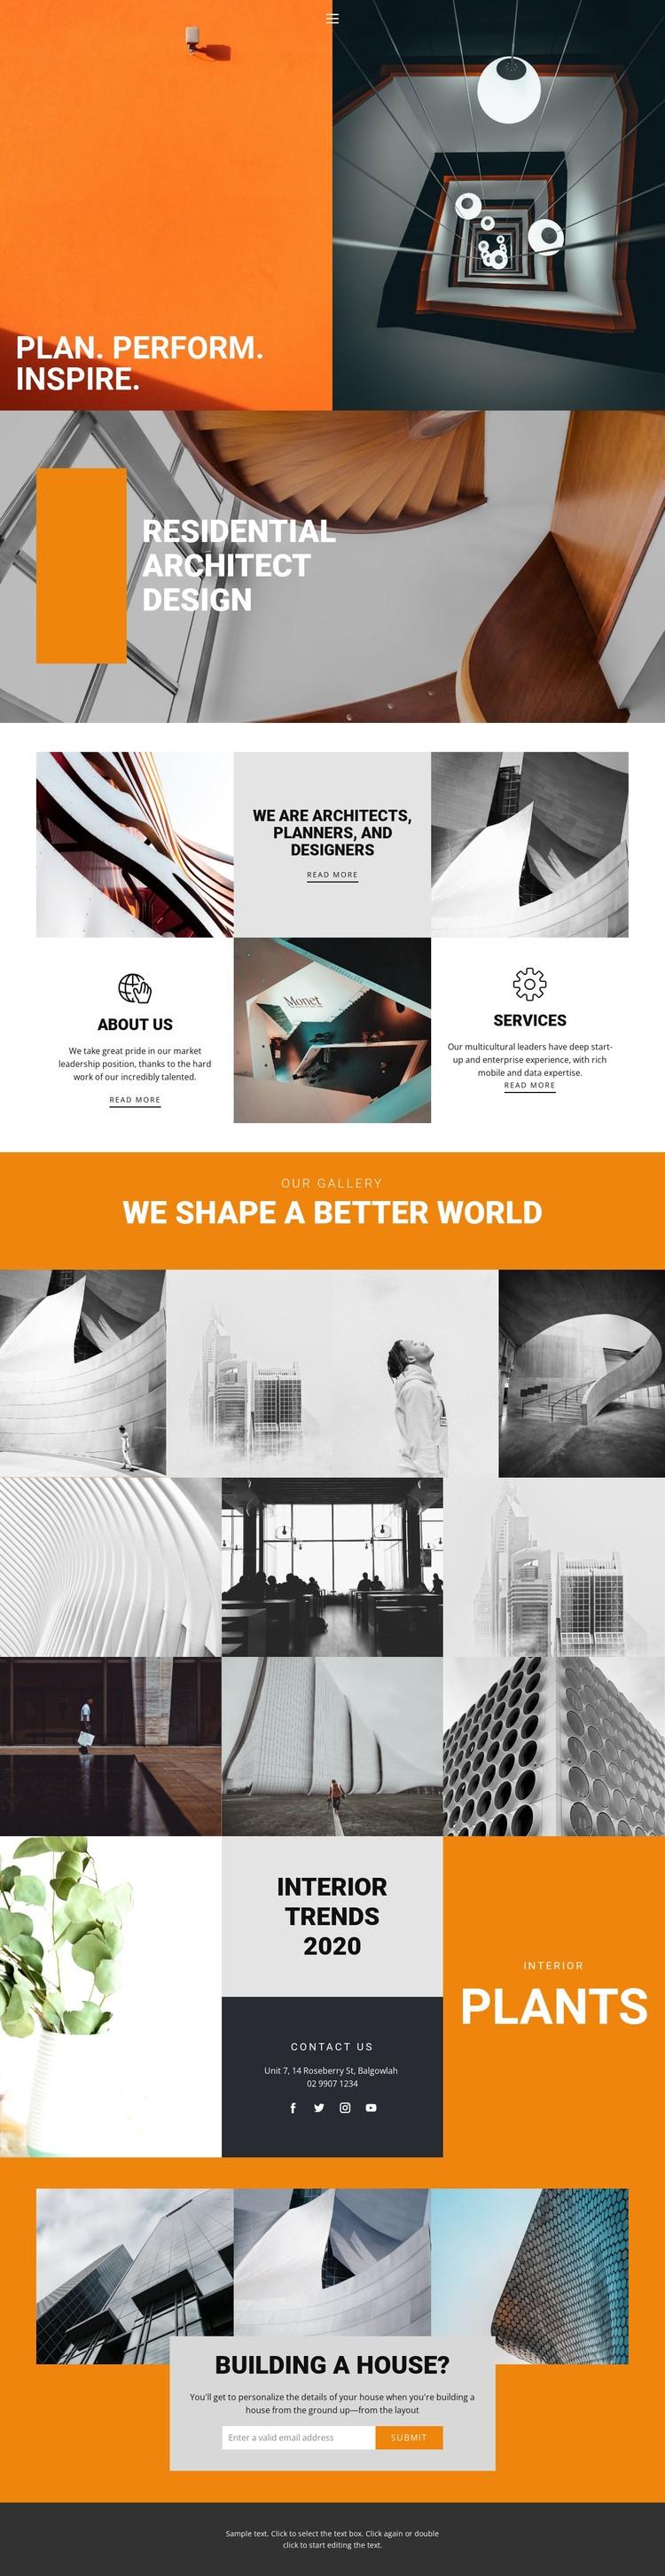 Inspiring ways of architecture Static Site Generator